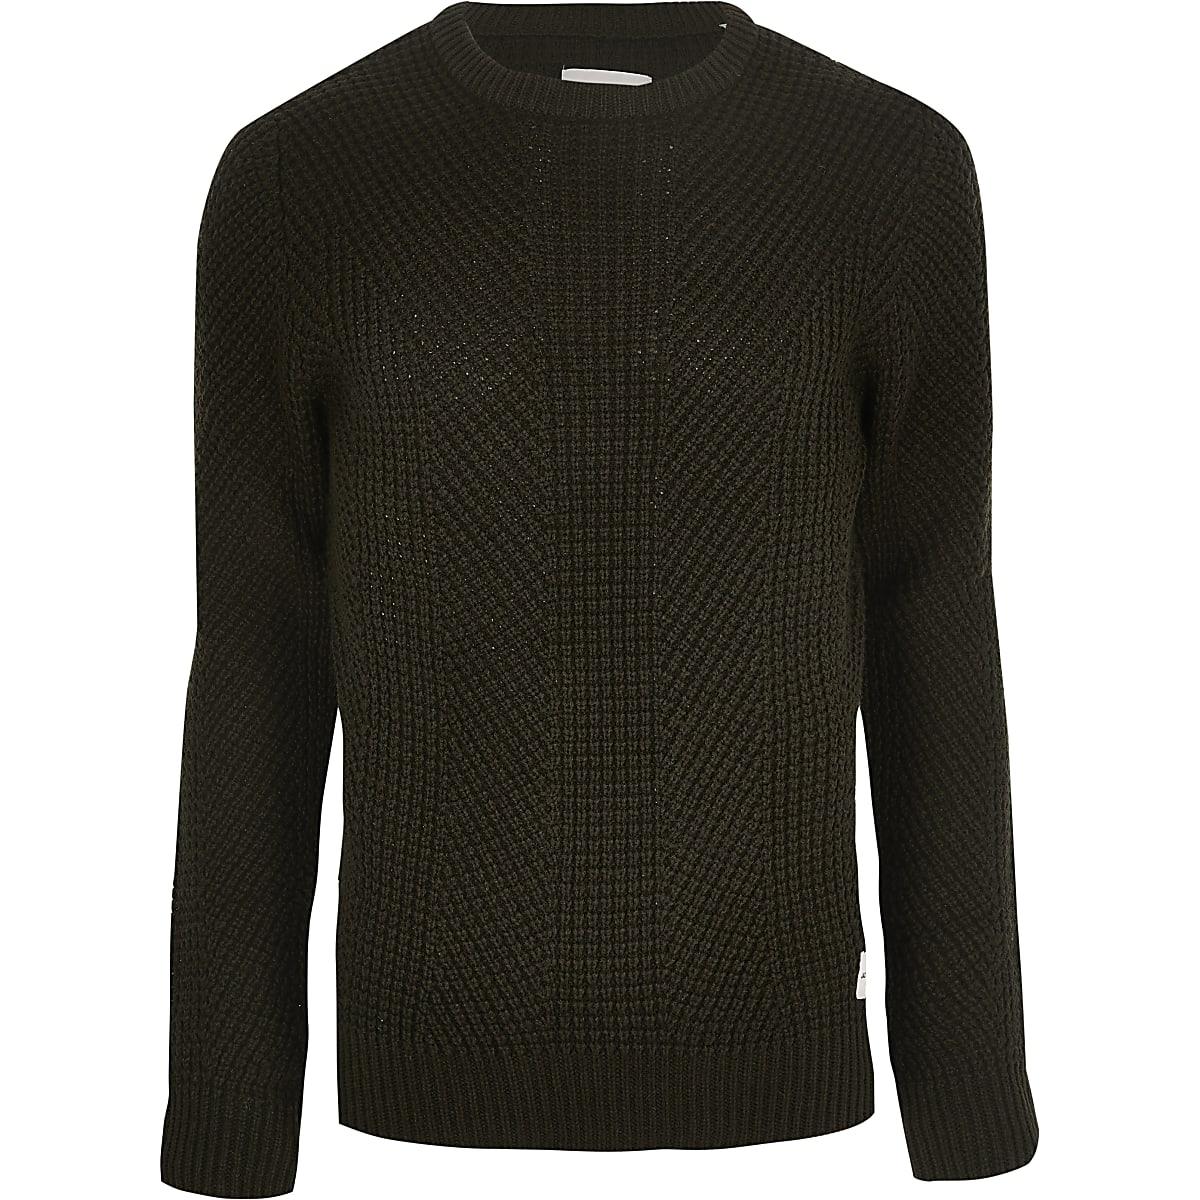 Jack and Jones dark green knit jumper